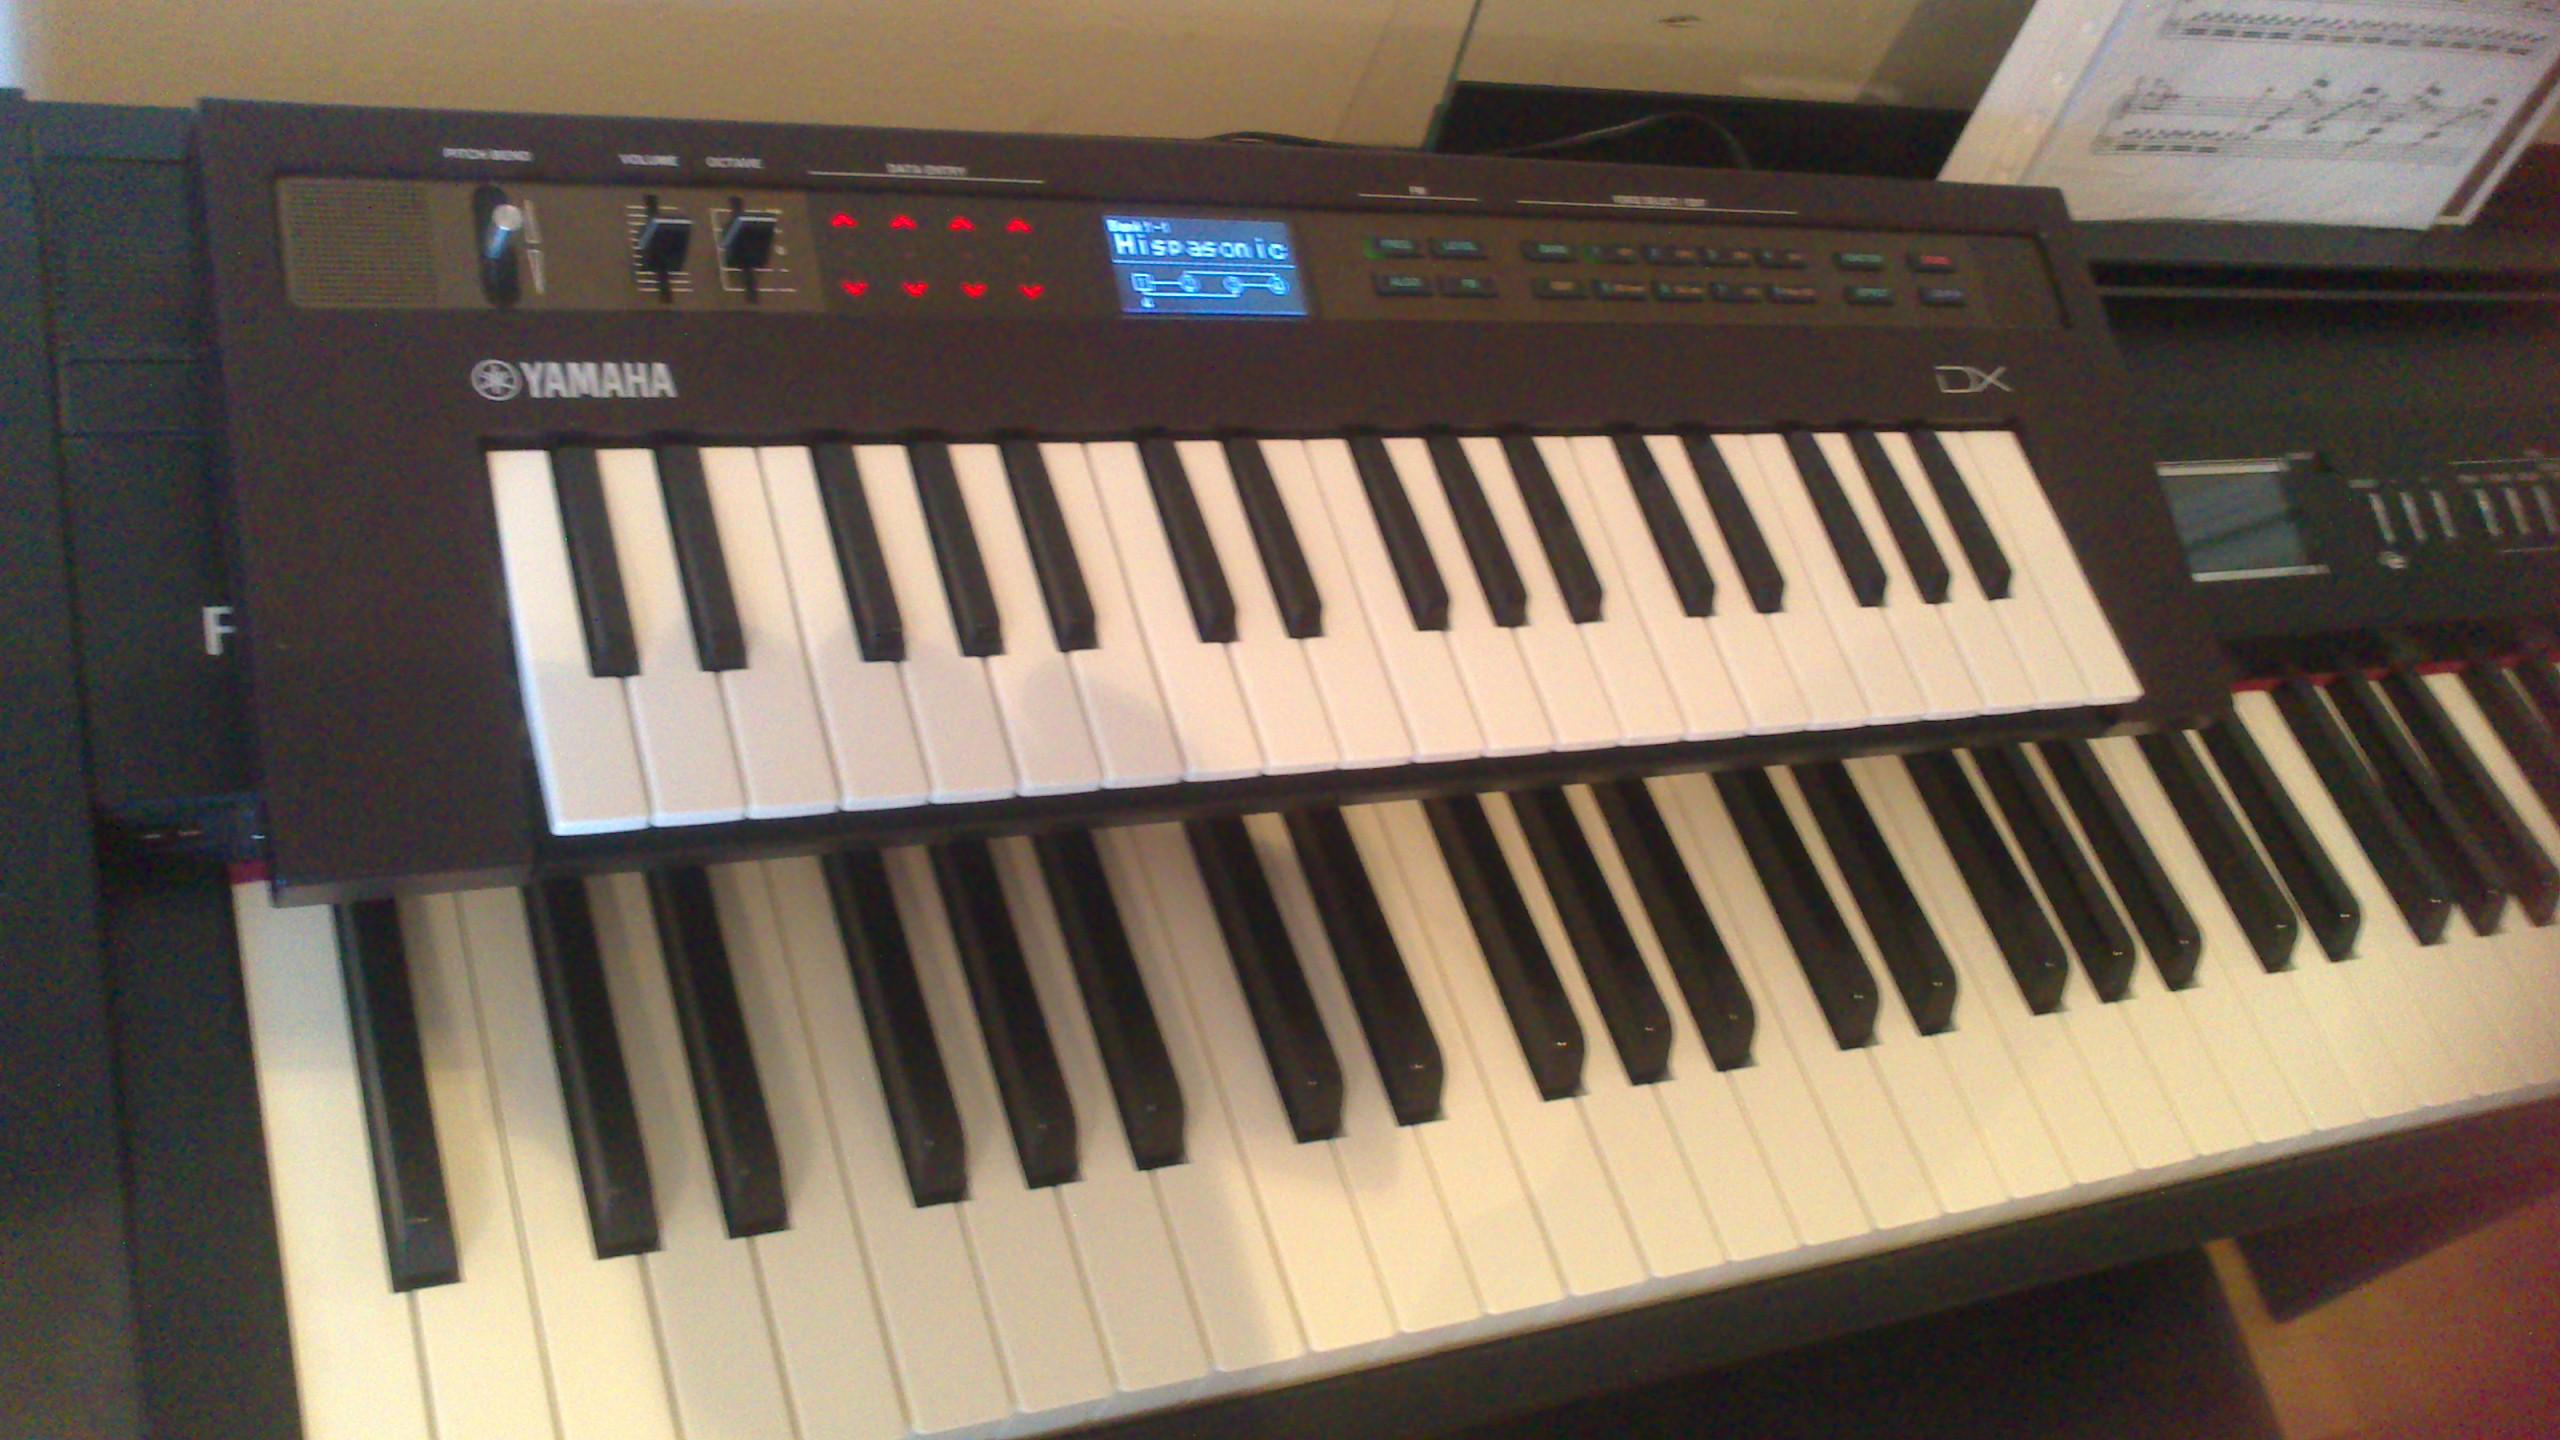 Probamos el Yamaha Reface DX | Hispasonic